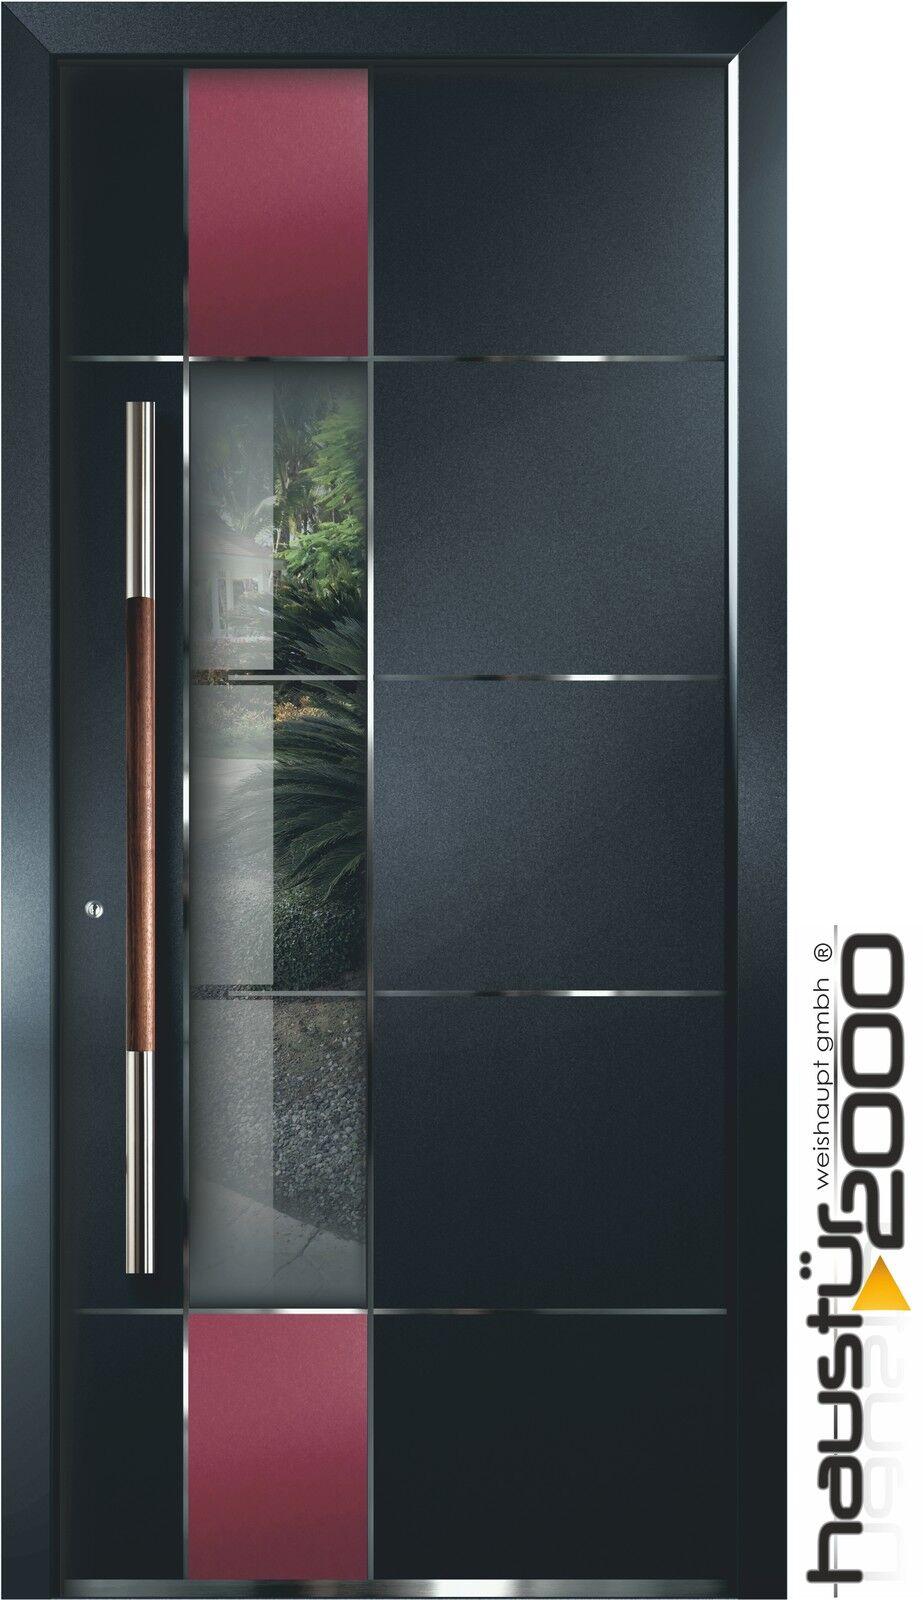 aluminium haust r alu haust r t r haust ren fl gel berdeckend mod 4030 fa ebay. Black Bedroom Furniture Sets. Home Design Ideas